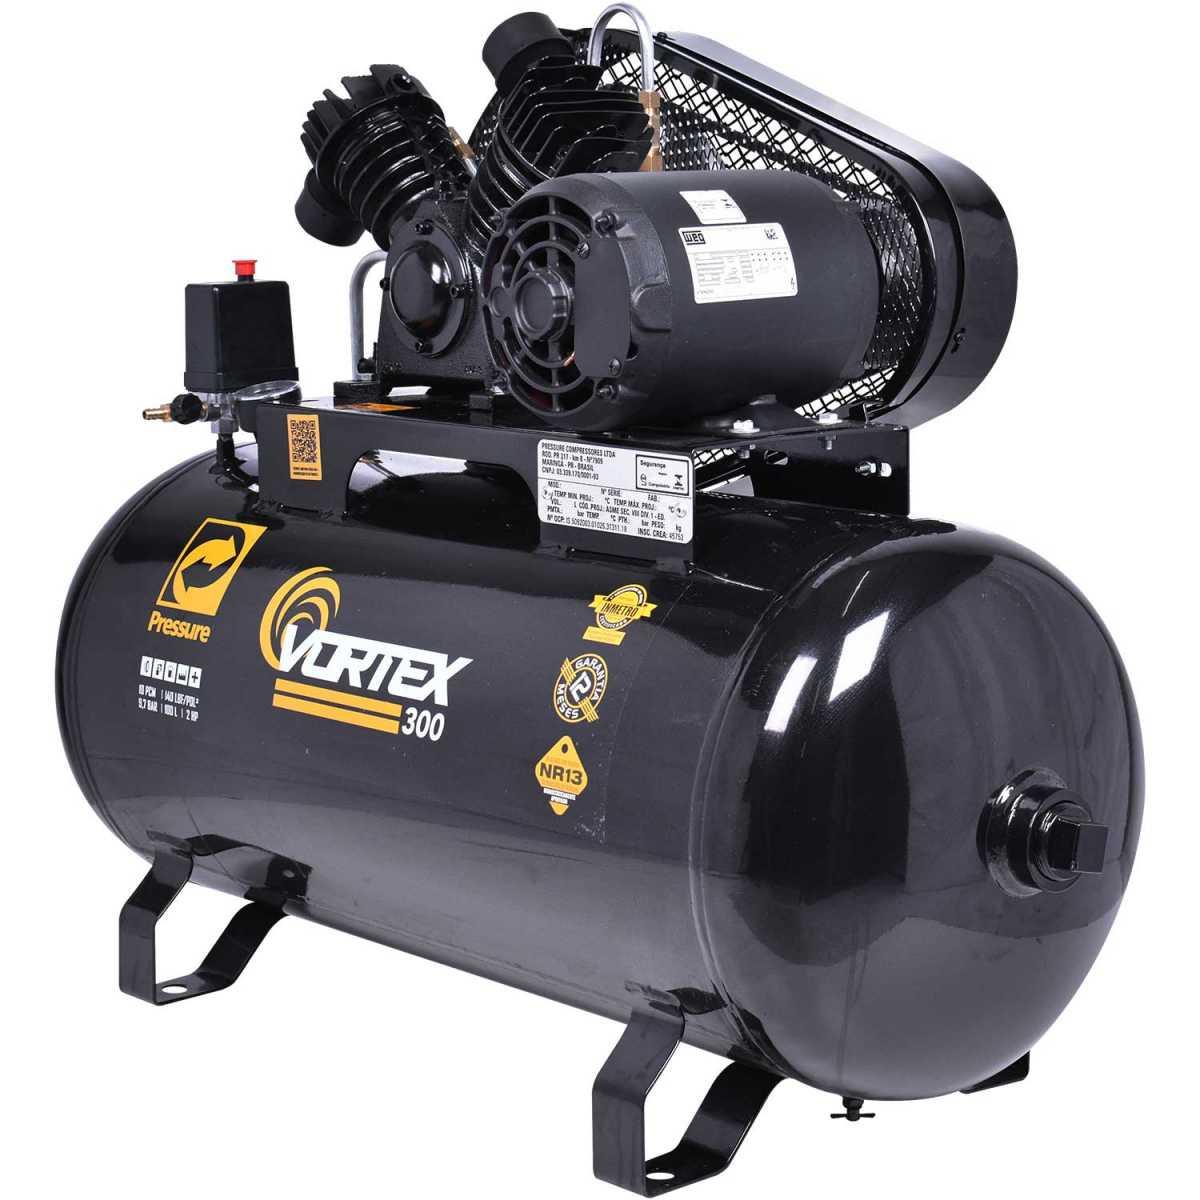 Compressor 10 Pcm V 100 Lts Vortex Pressure - 220/380V Trif